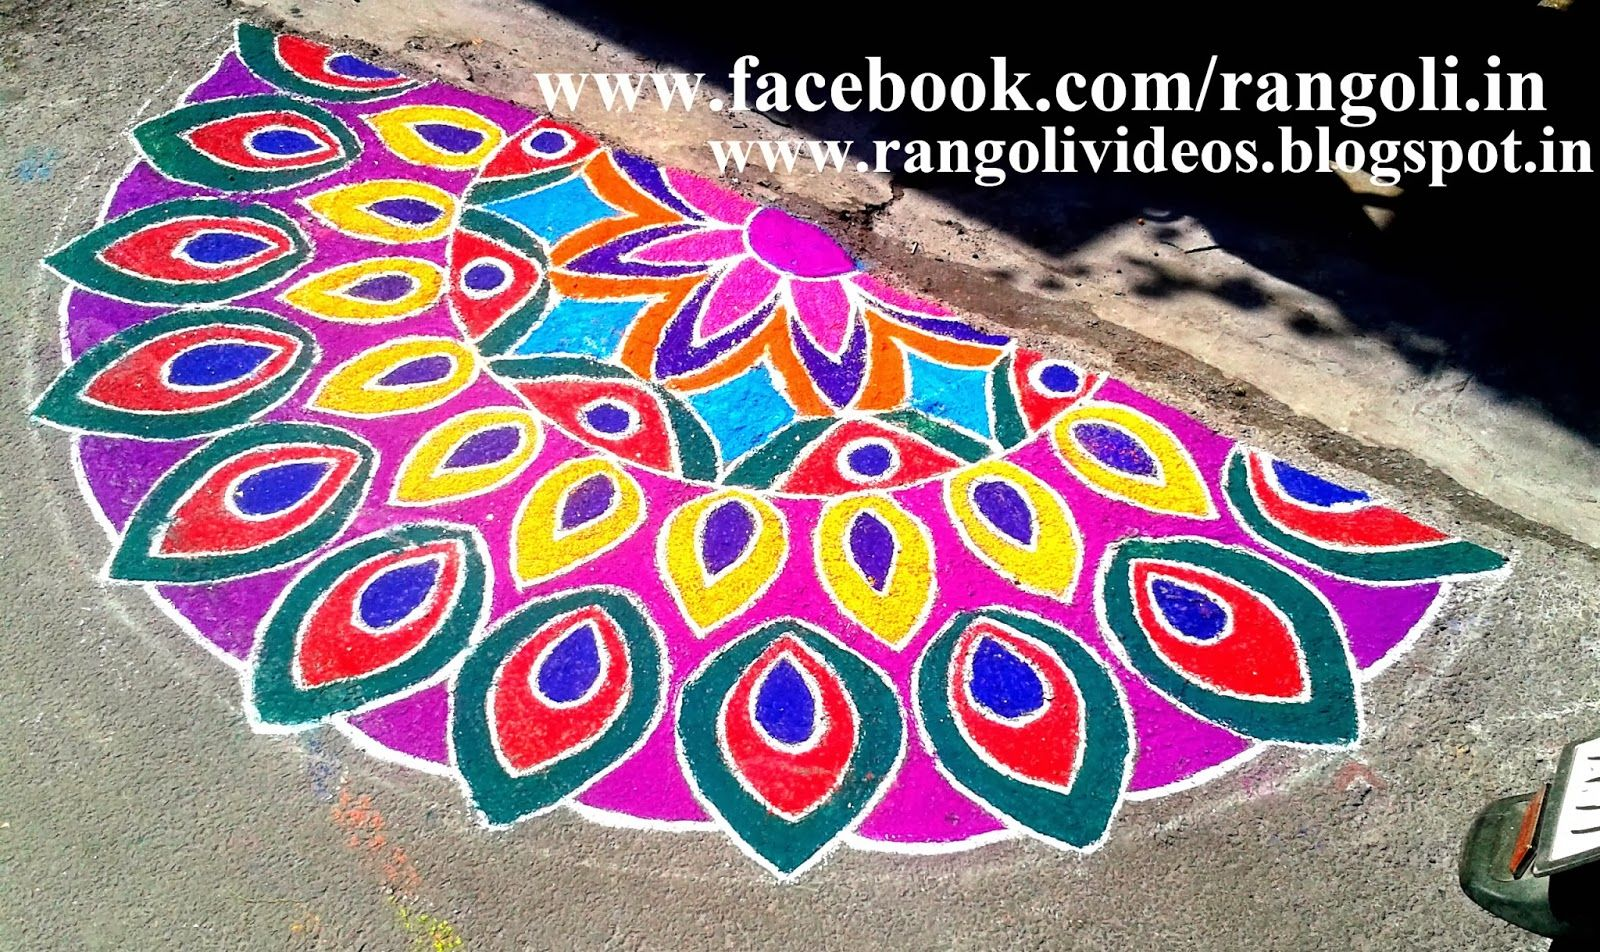 Diwali Rangoli Pinterest: Diwali Rangoli Designs Kolam DesignsVideos: Diwali Rangoli